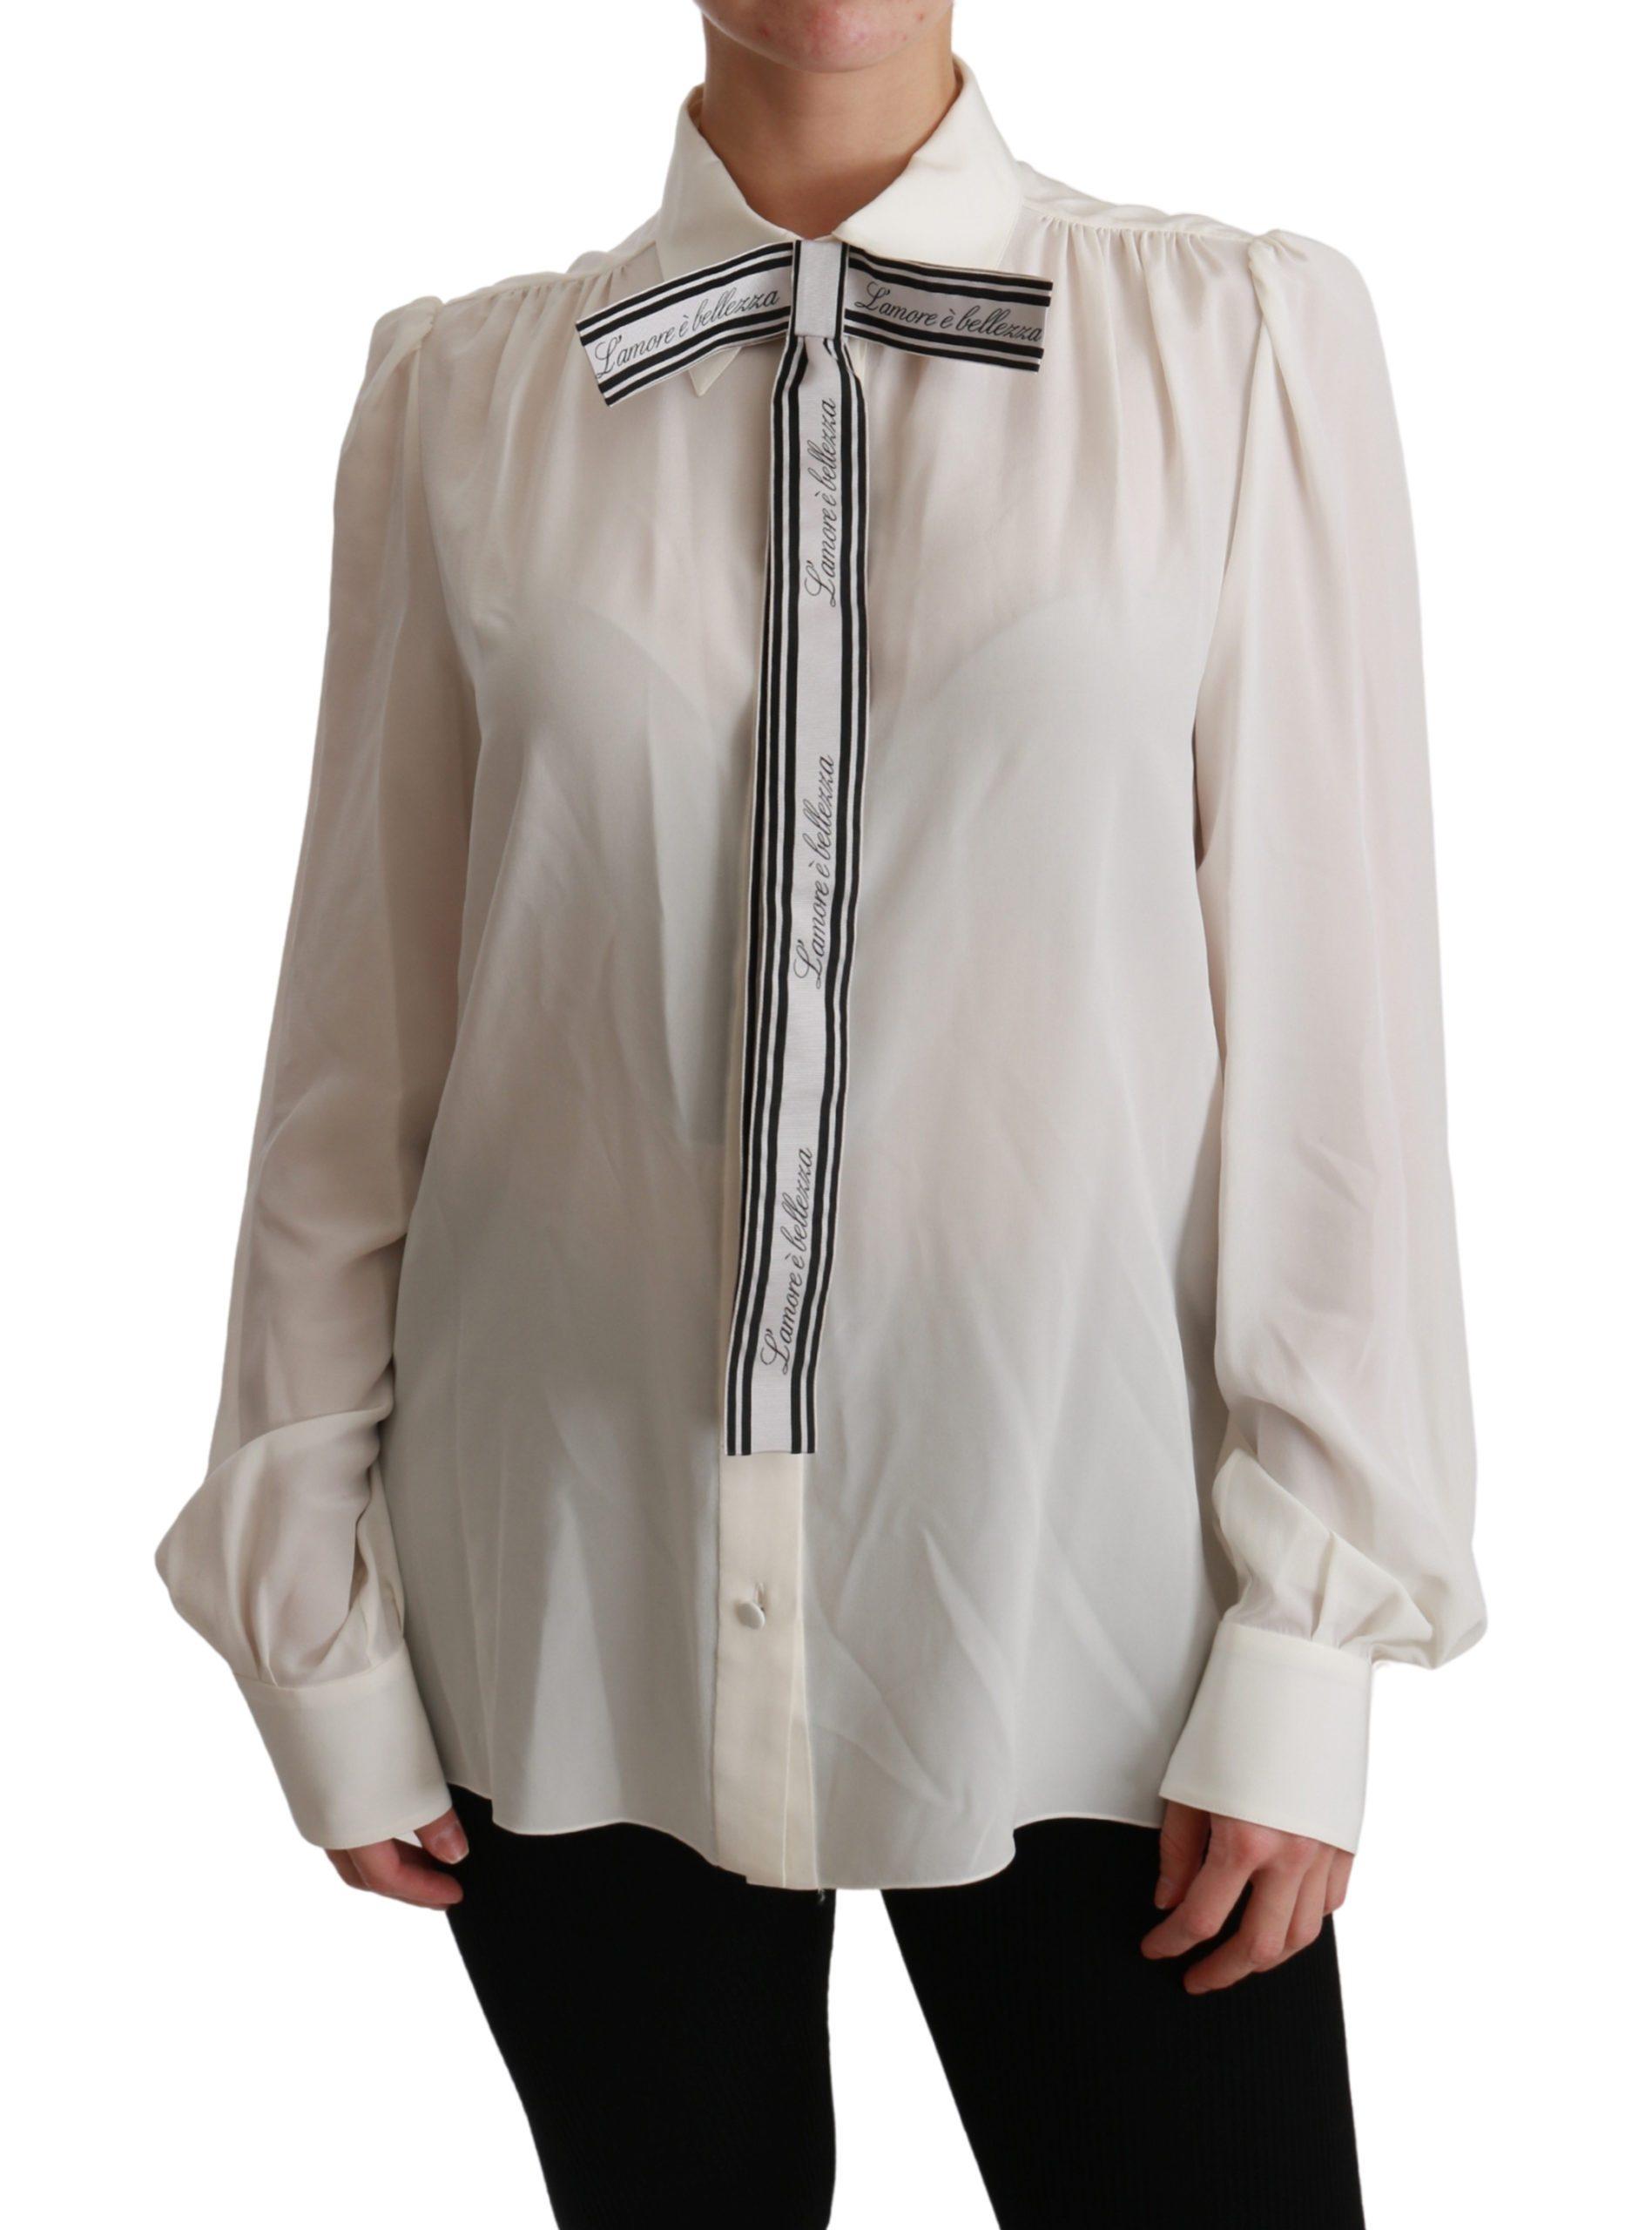 Dolce & Gabbana Women's Long Sleeve Silk Shirt White TSH4473 - IT44|L